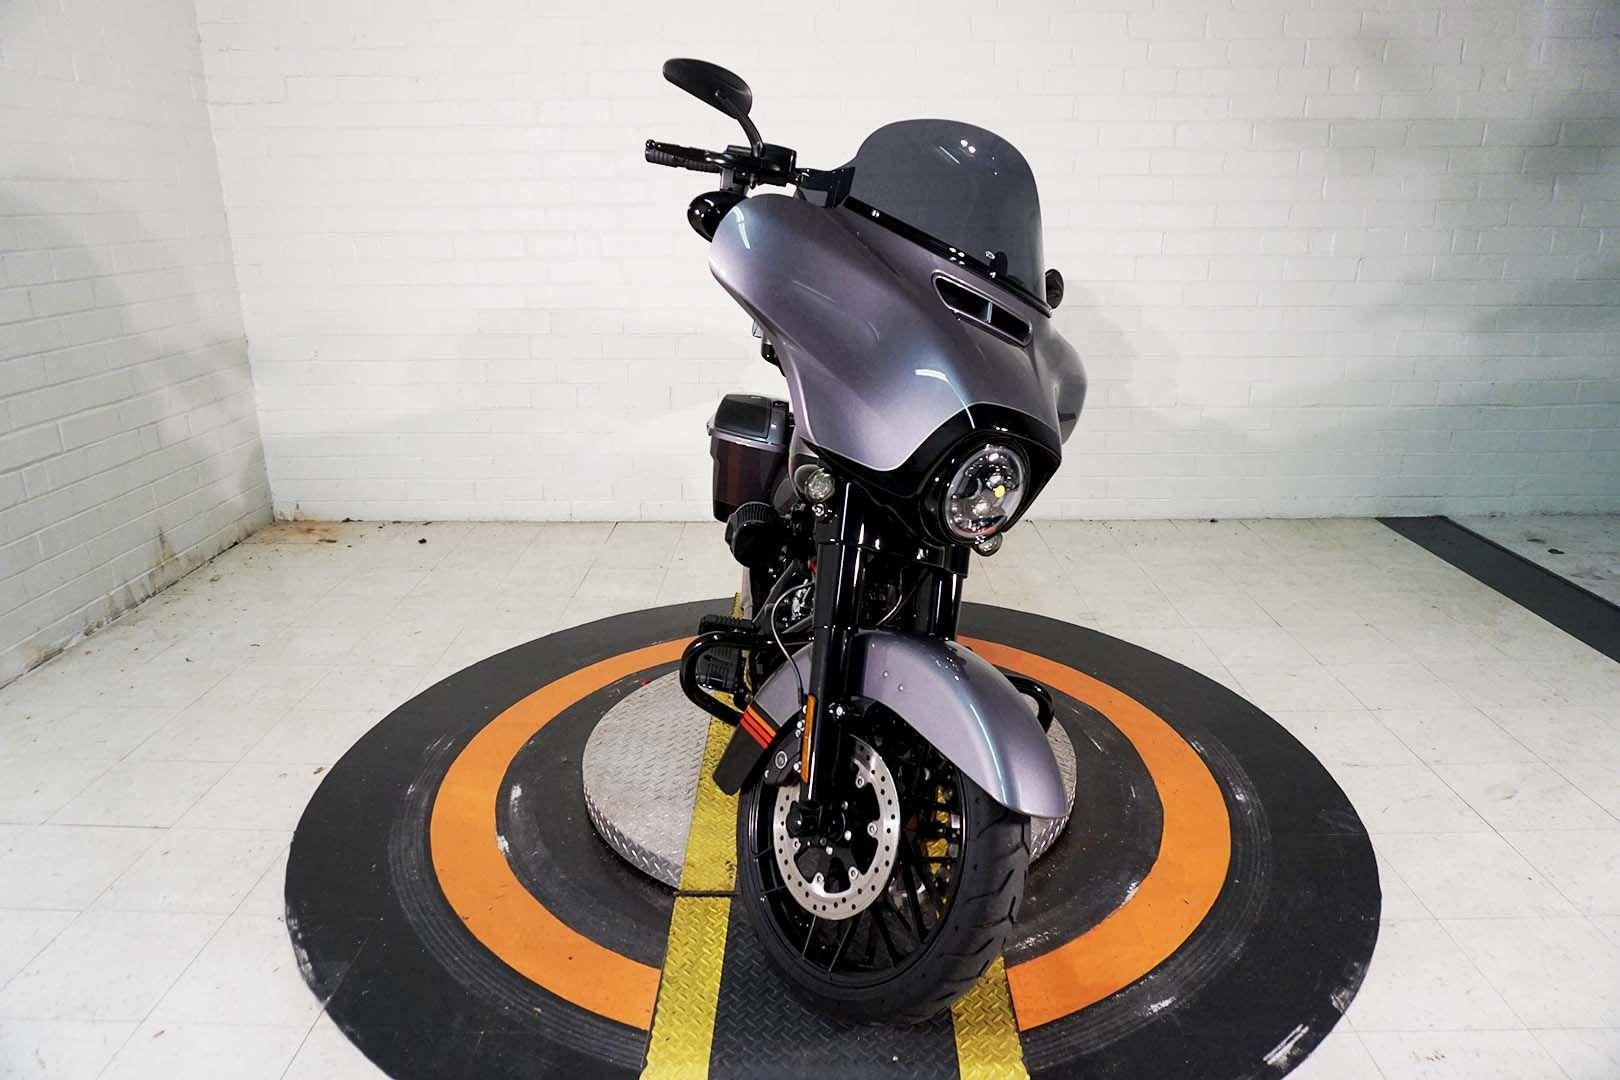 Pre-Owned 2020 Harley-Davidson CVO Street Glide